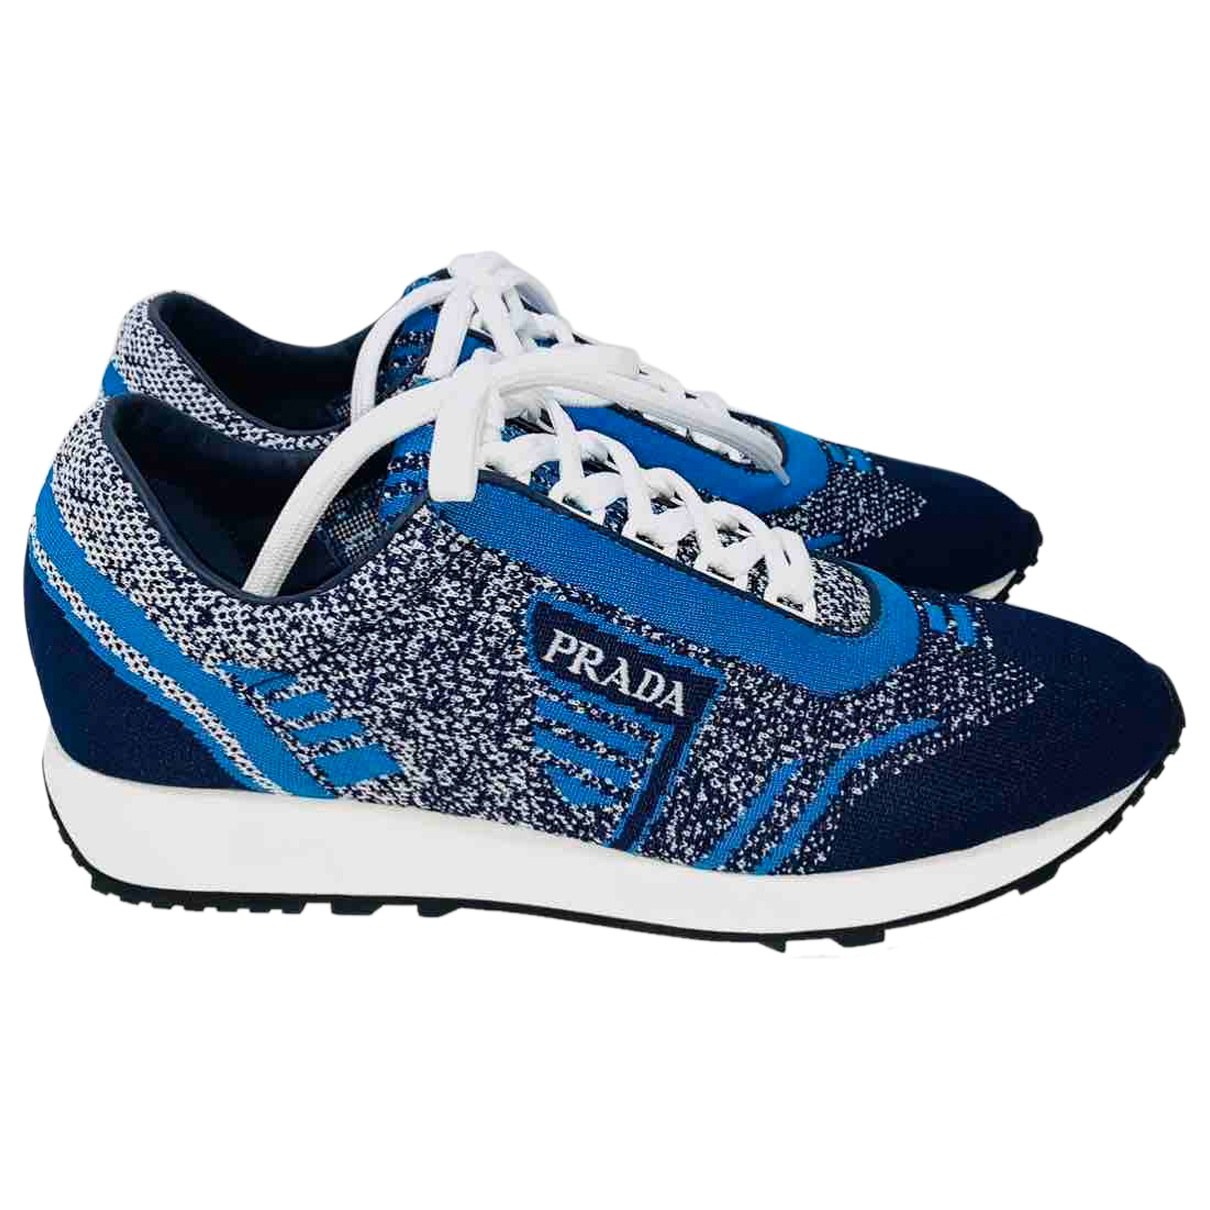 Prada - Baskets   pour femme en toile - bleu